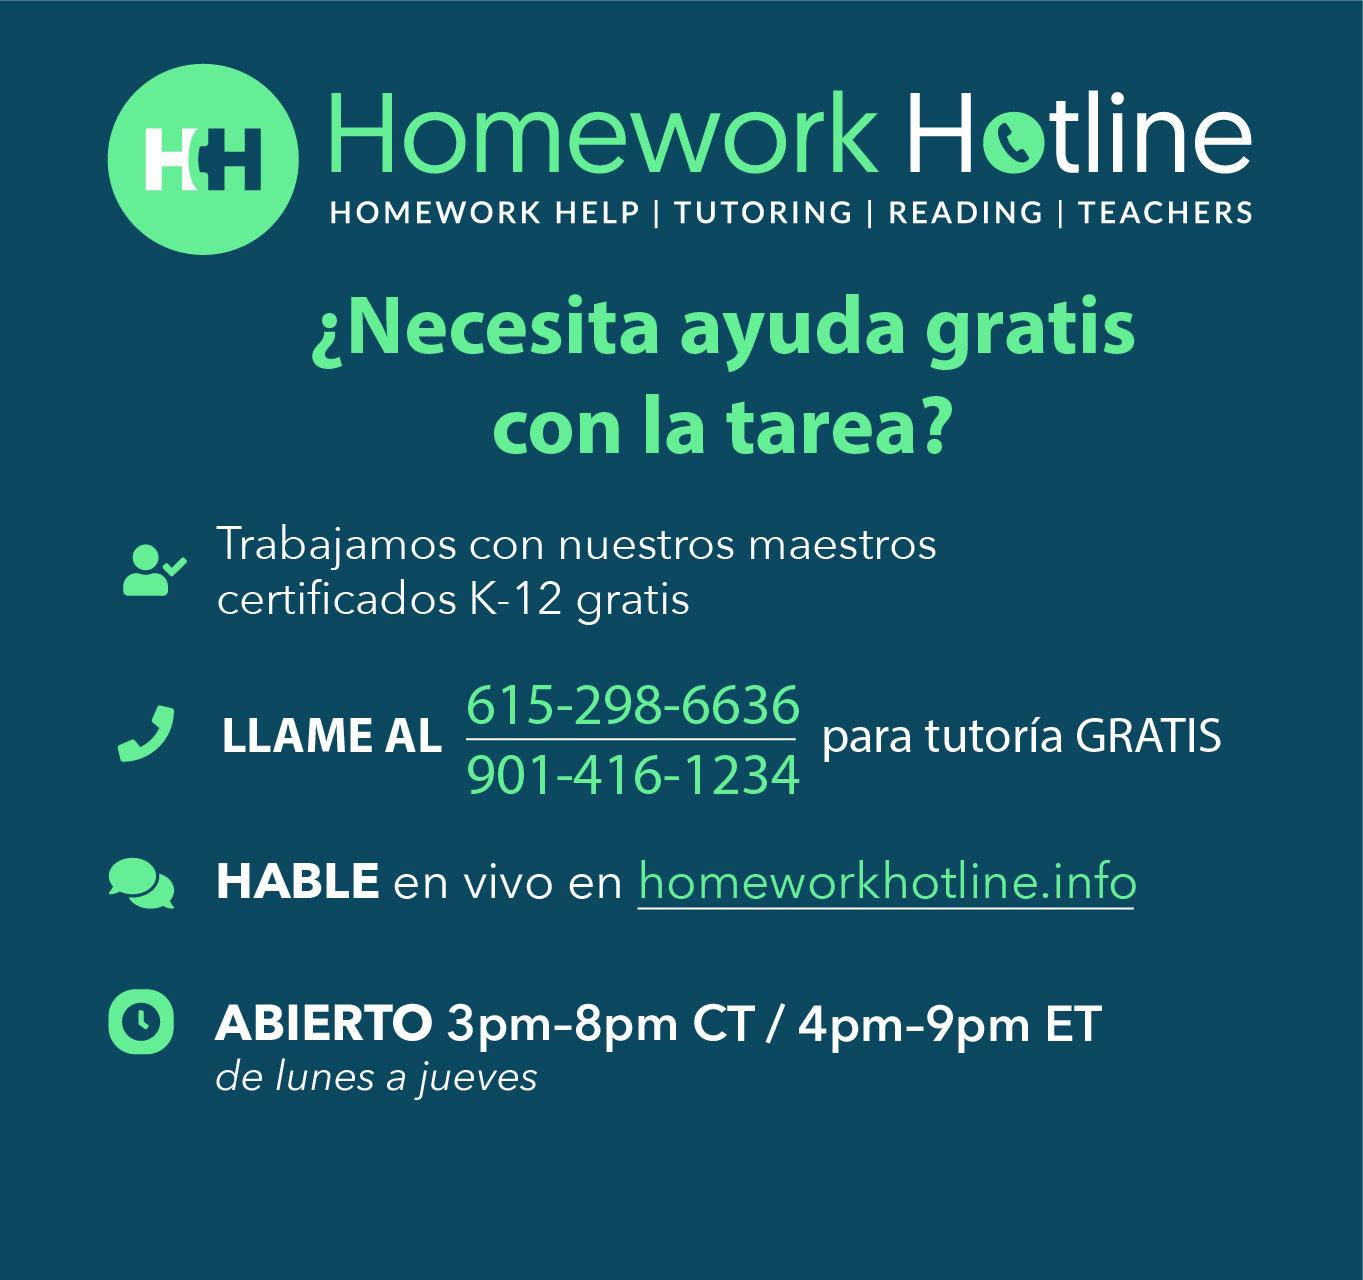 Homework Hotline Spanish Information